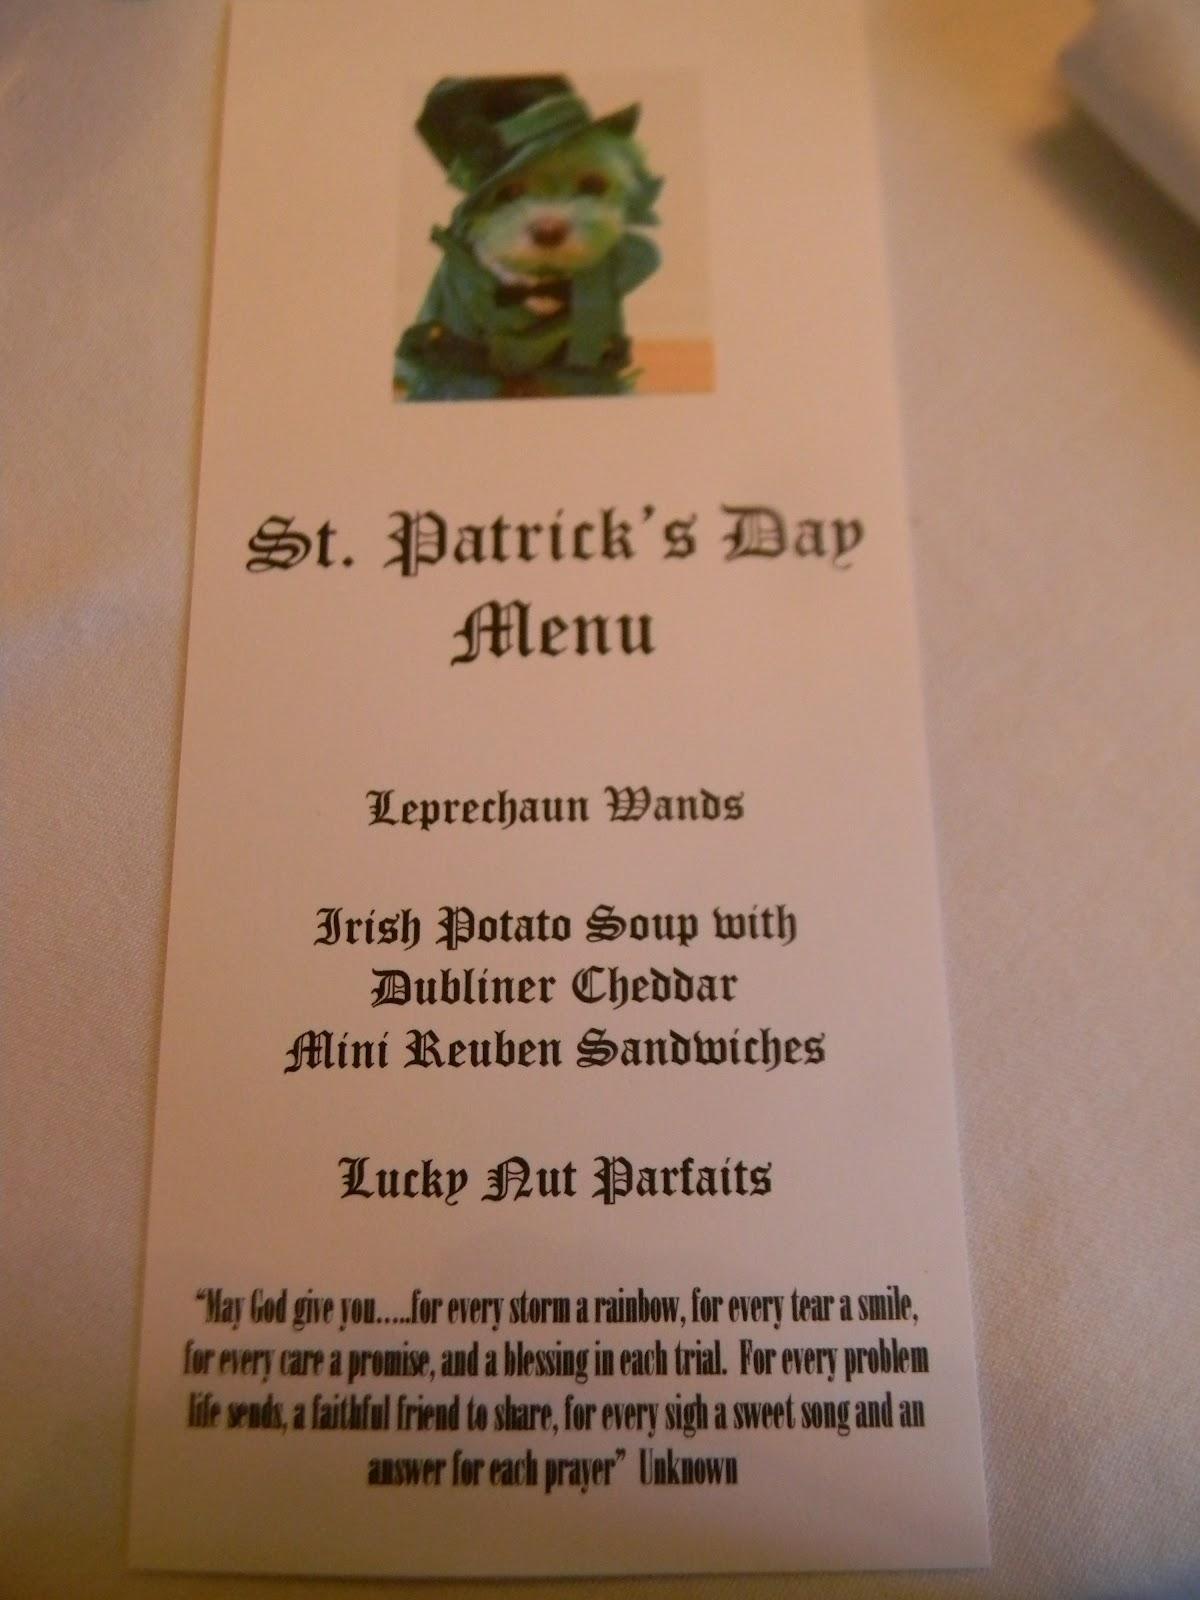 A Toile Tale: Bridge Buddies Come for St. Patrick's Luncheon